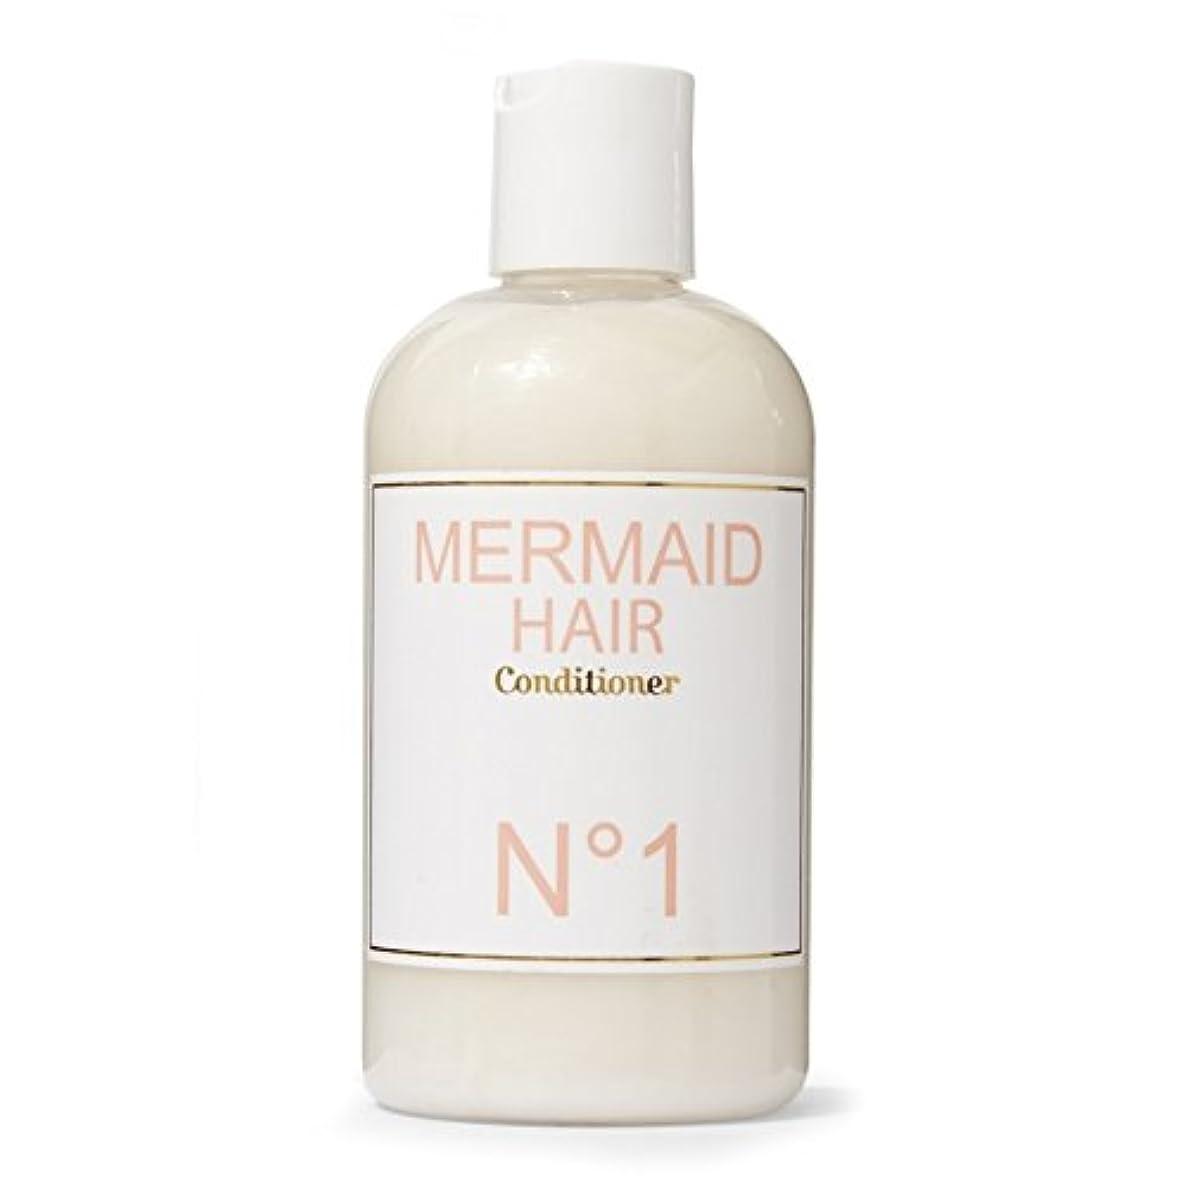 Mermaid Perfume Mermaid Conditioner 300ml - 人魚香水人魚コンディショナー300ミリリットル [並行輸入品]